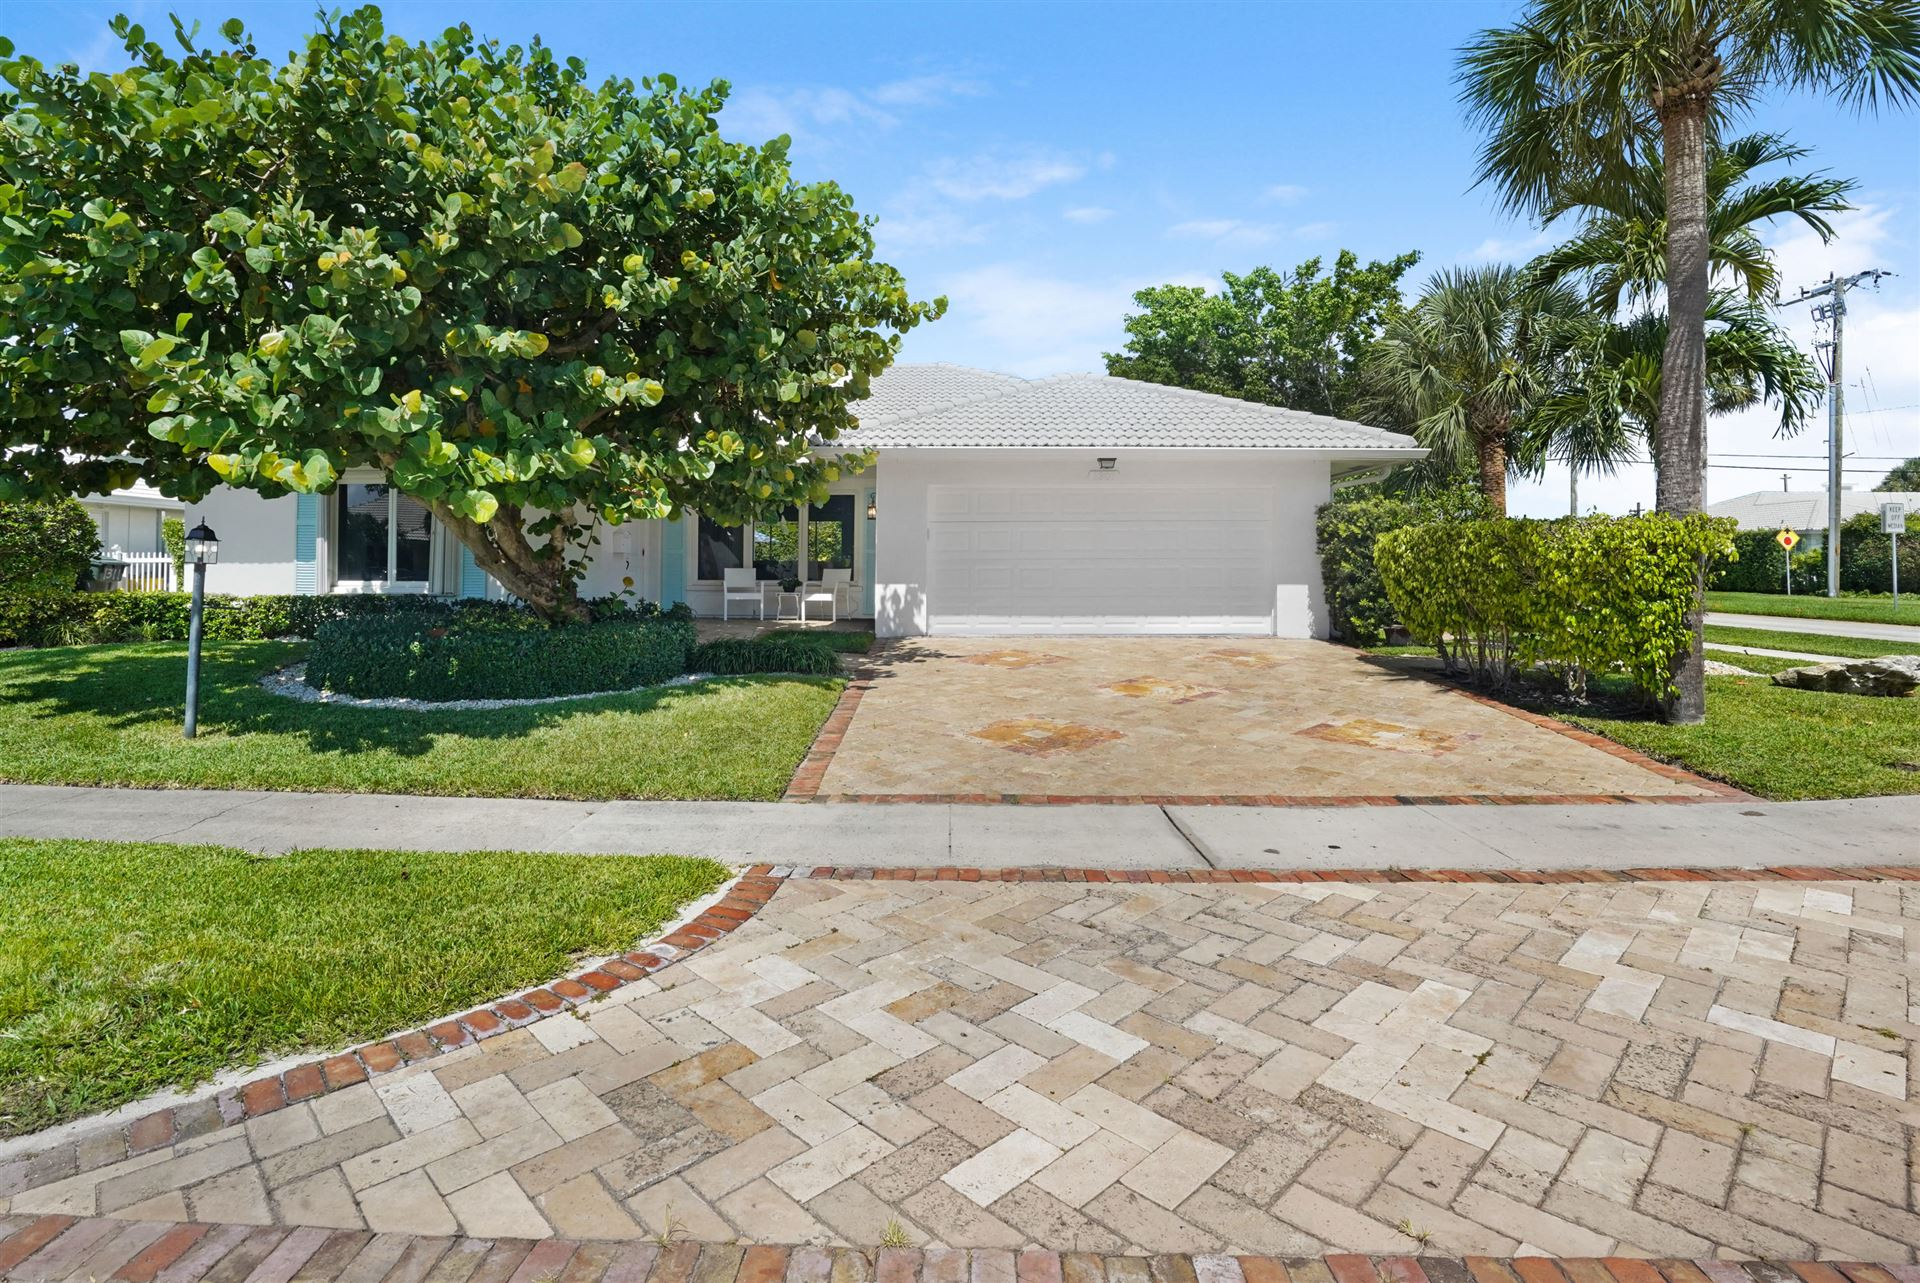 Photo of 1301 SW Tamarind Way, Boca Raton, FL 33486 (MLS # RX-10733776)